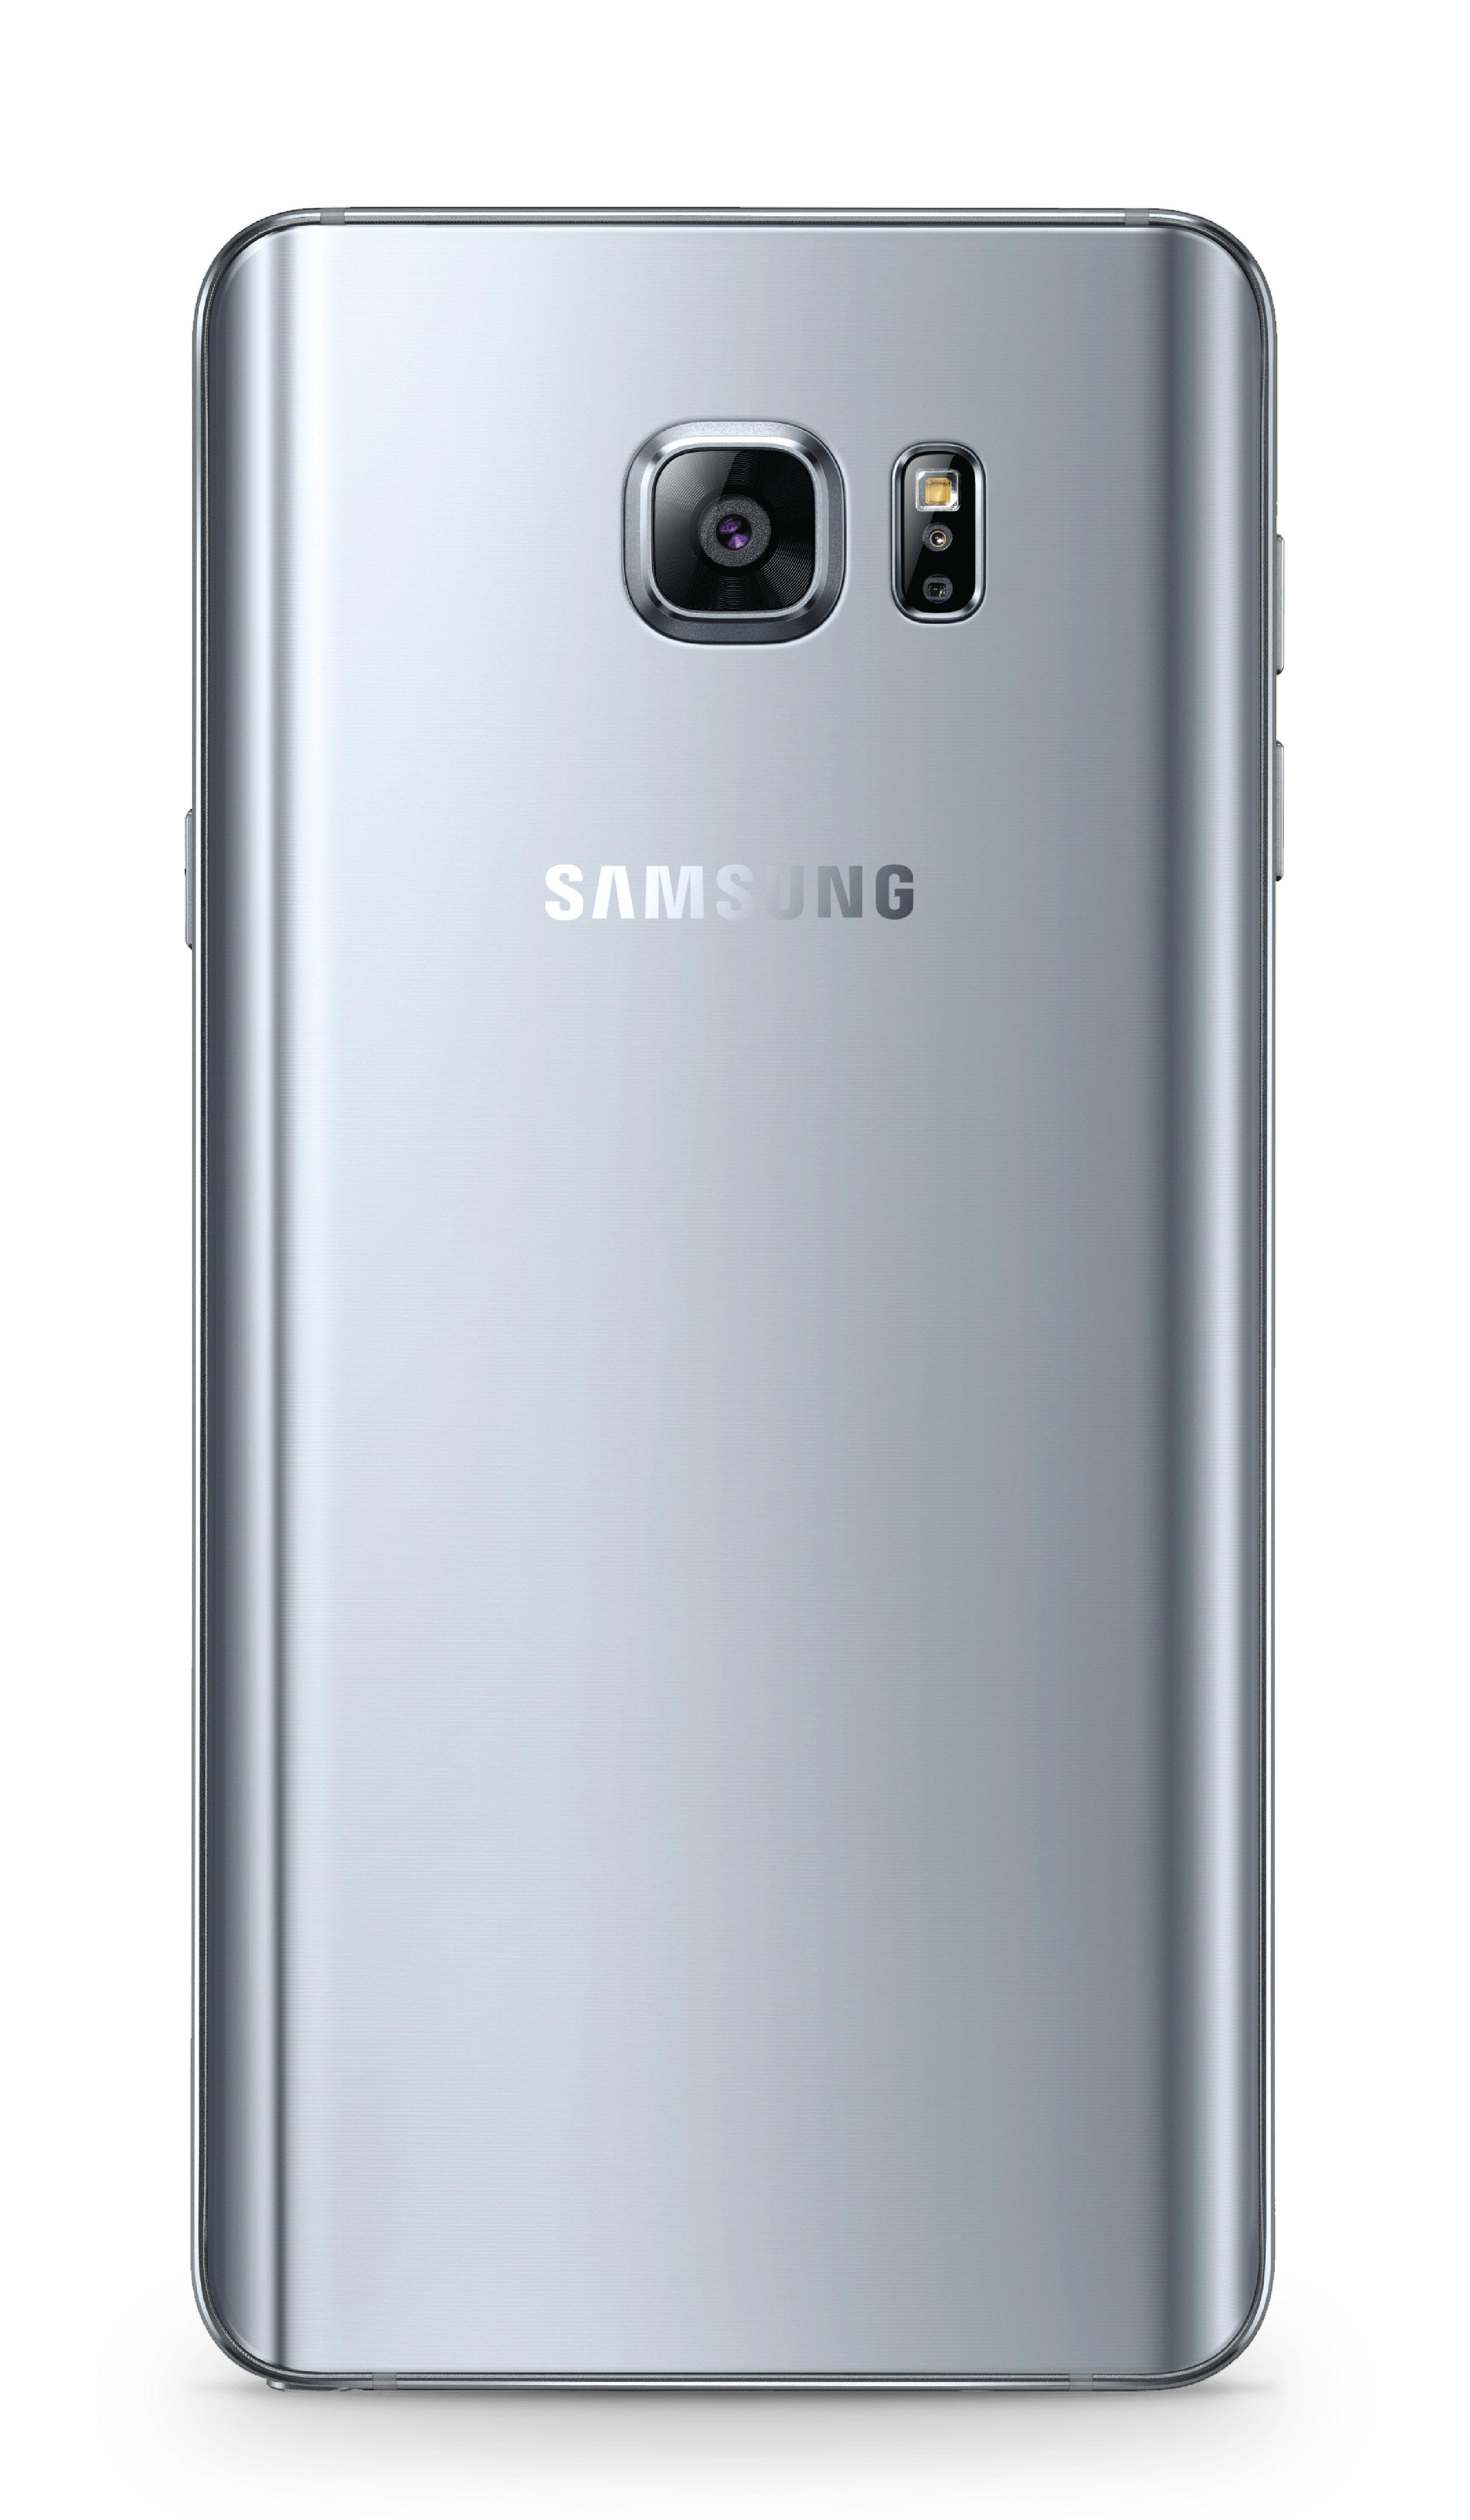 Samsung Galaxy Note 5 image